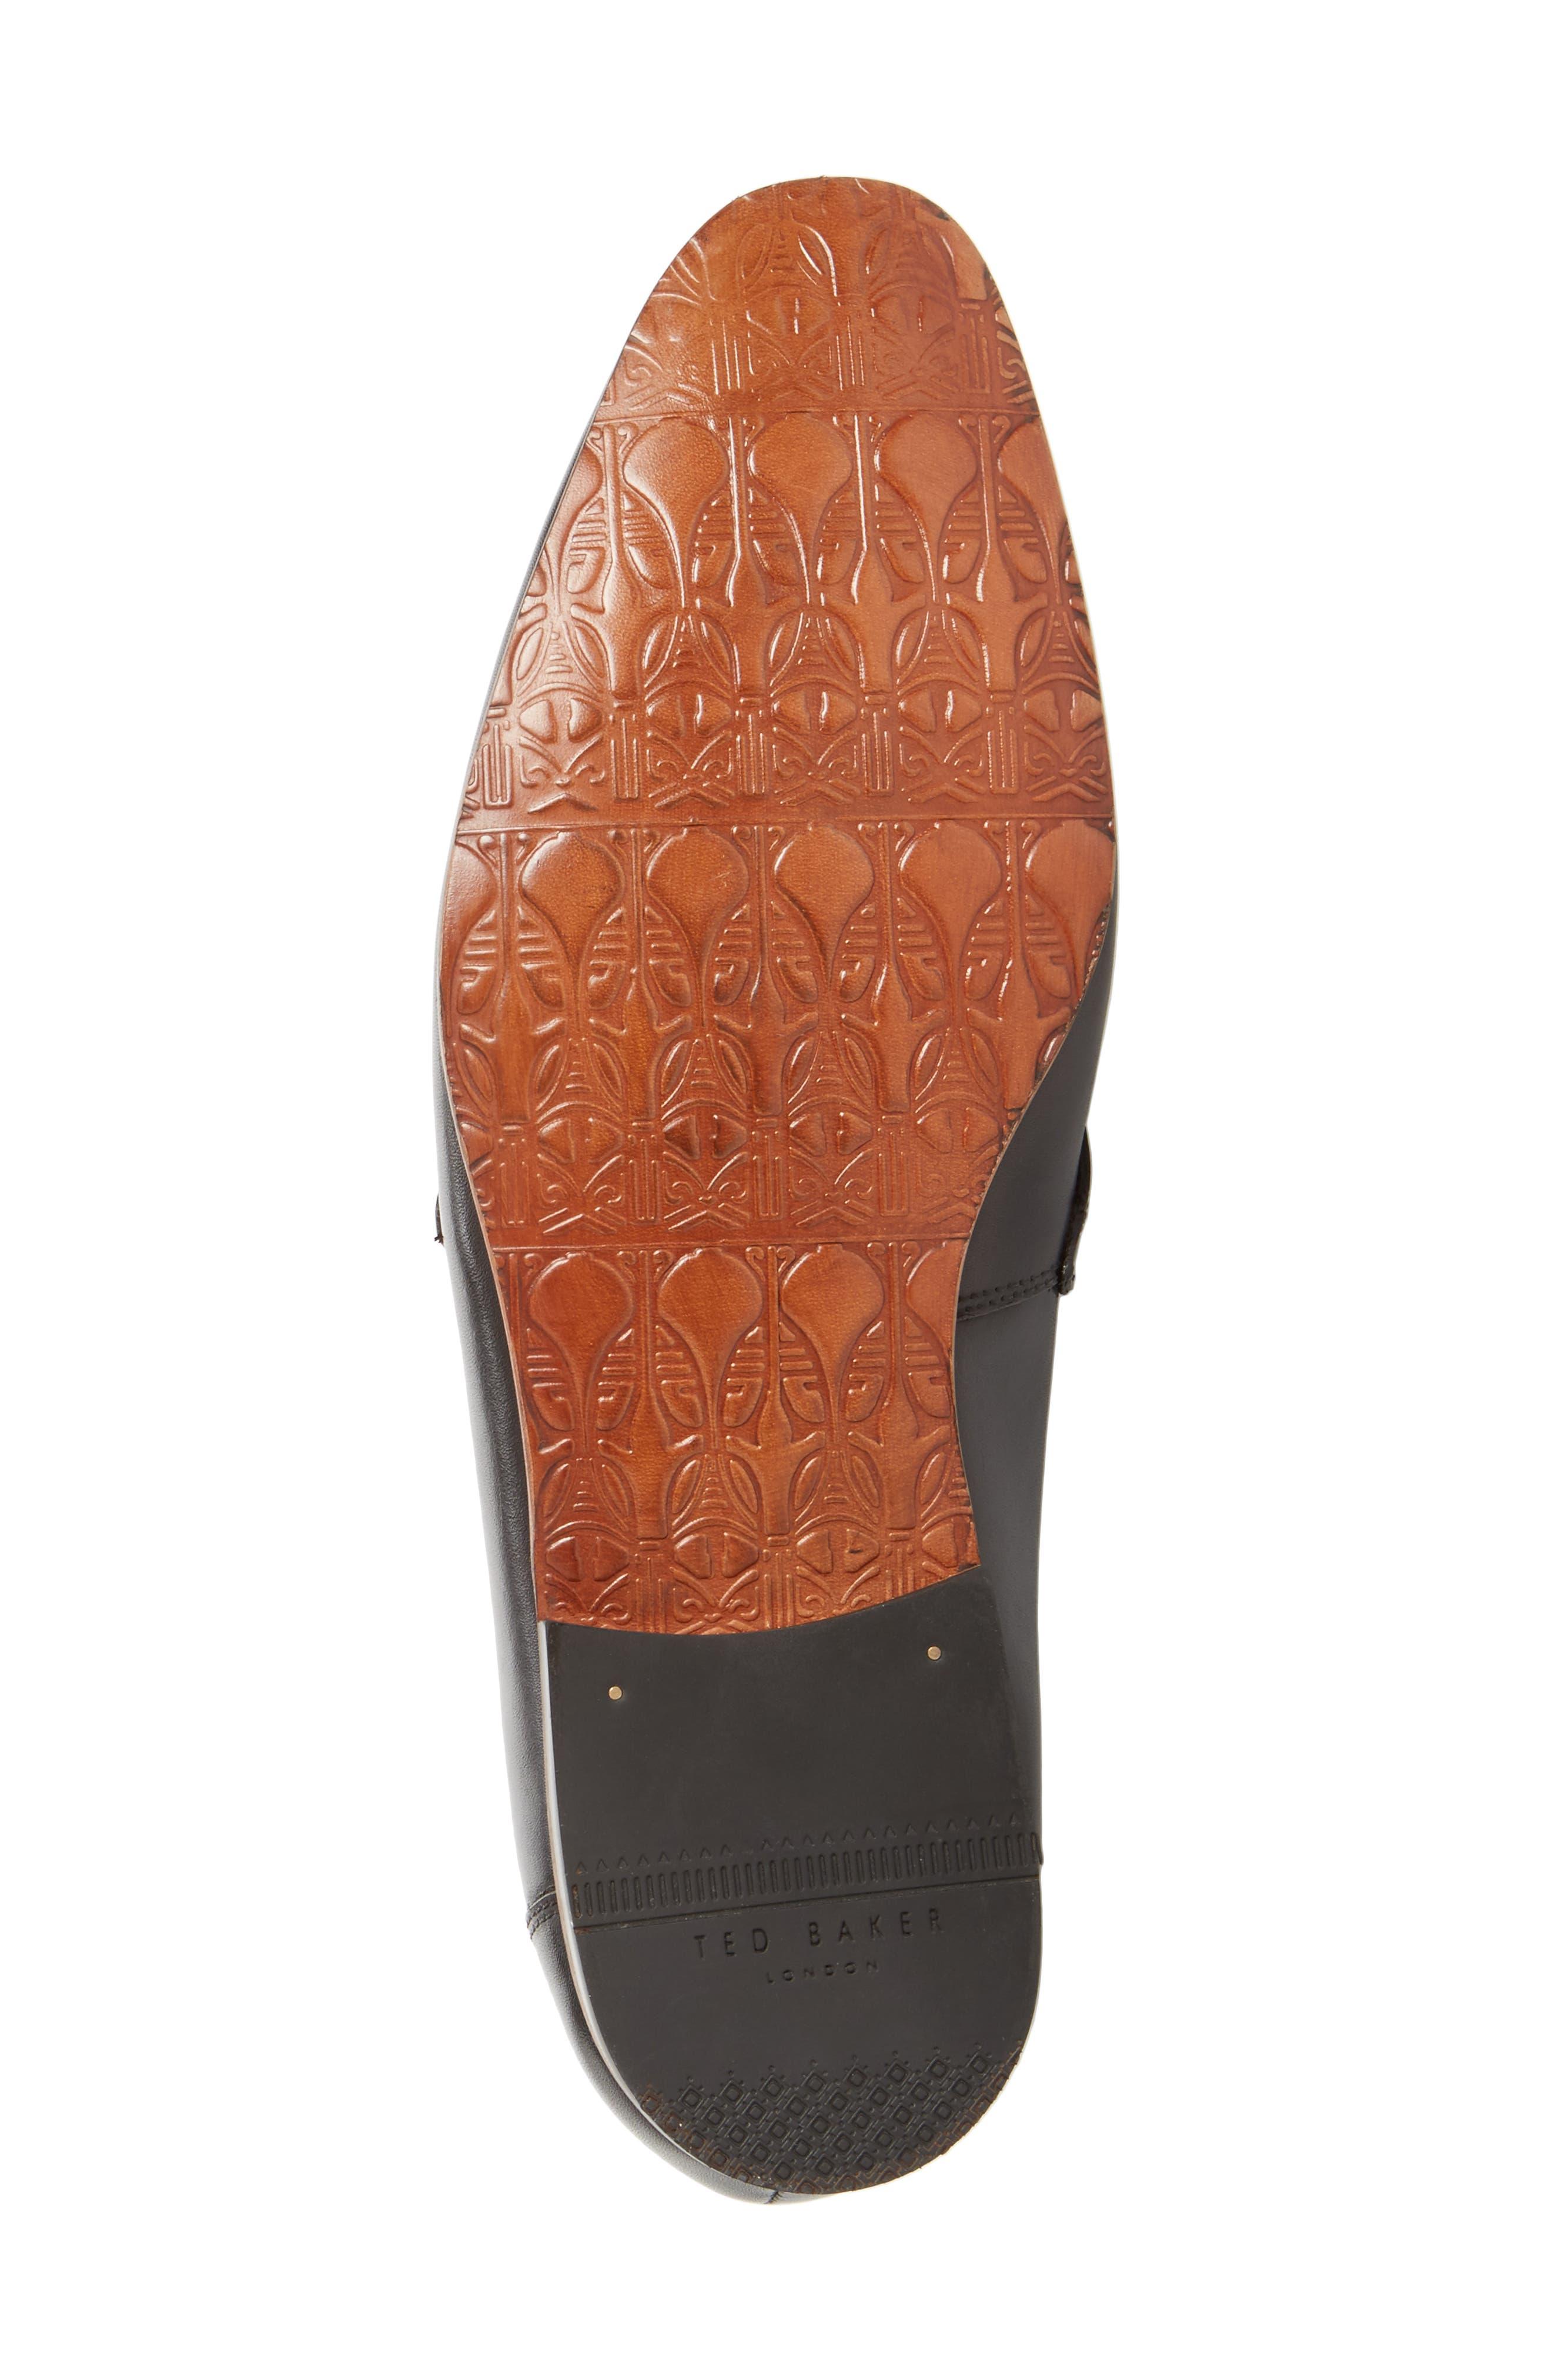 Grafit Tassel Loafer,                             Alternate thumbnail 5, color,                             Black Leather